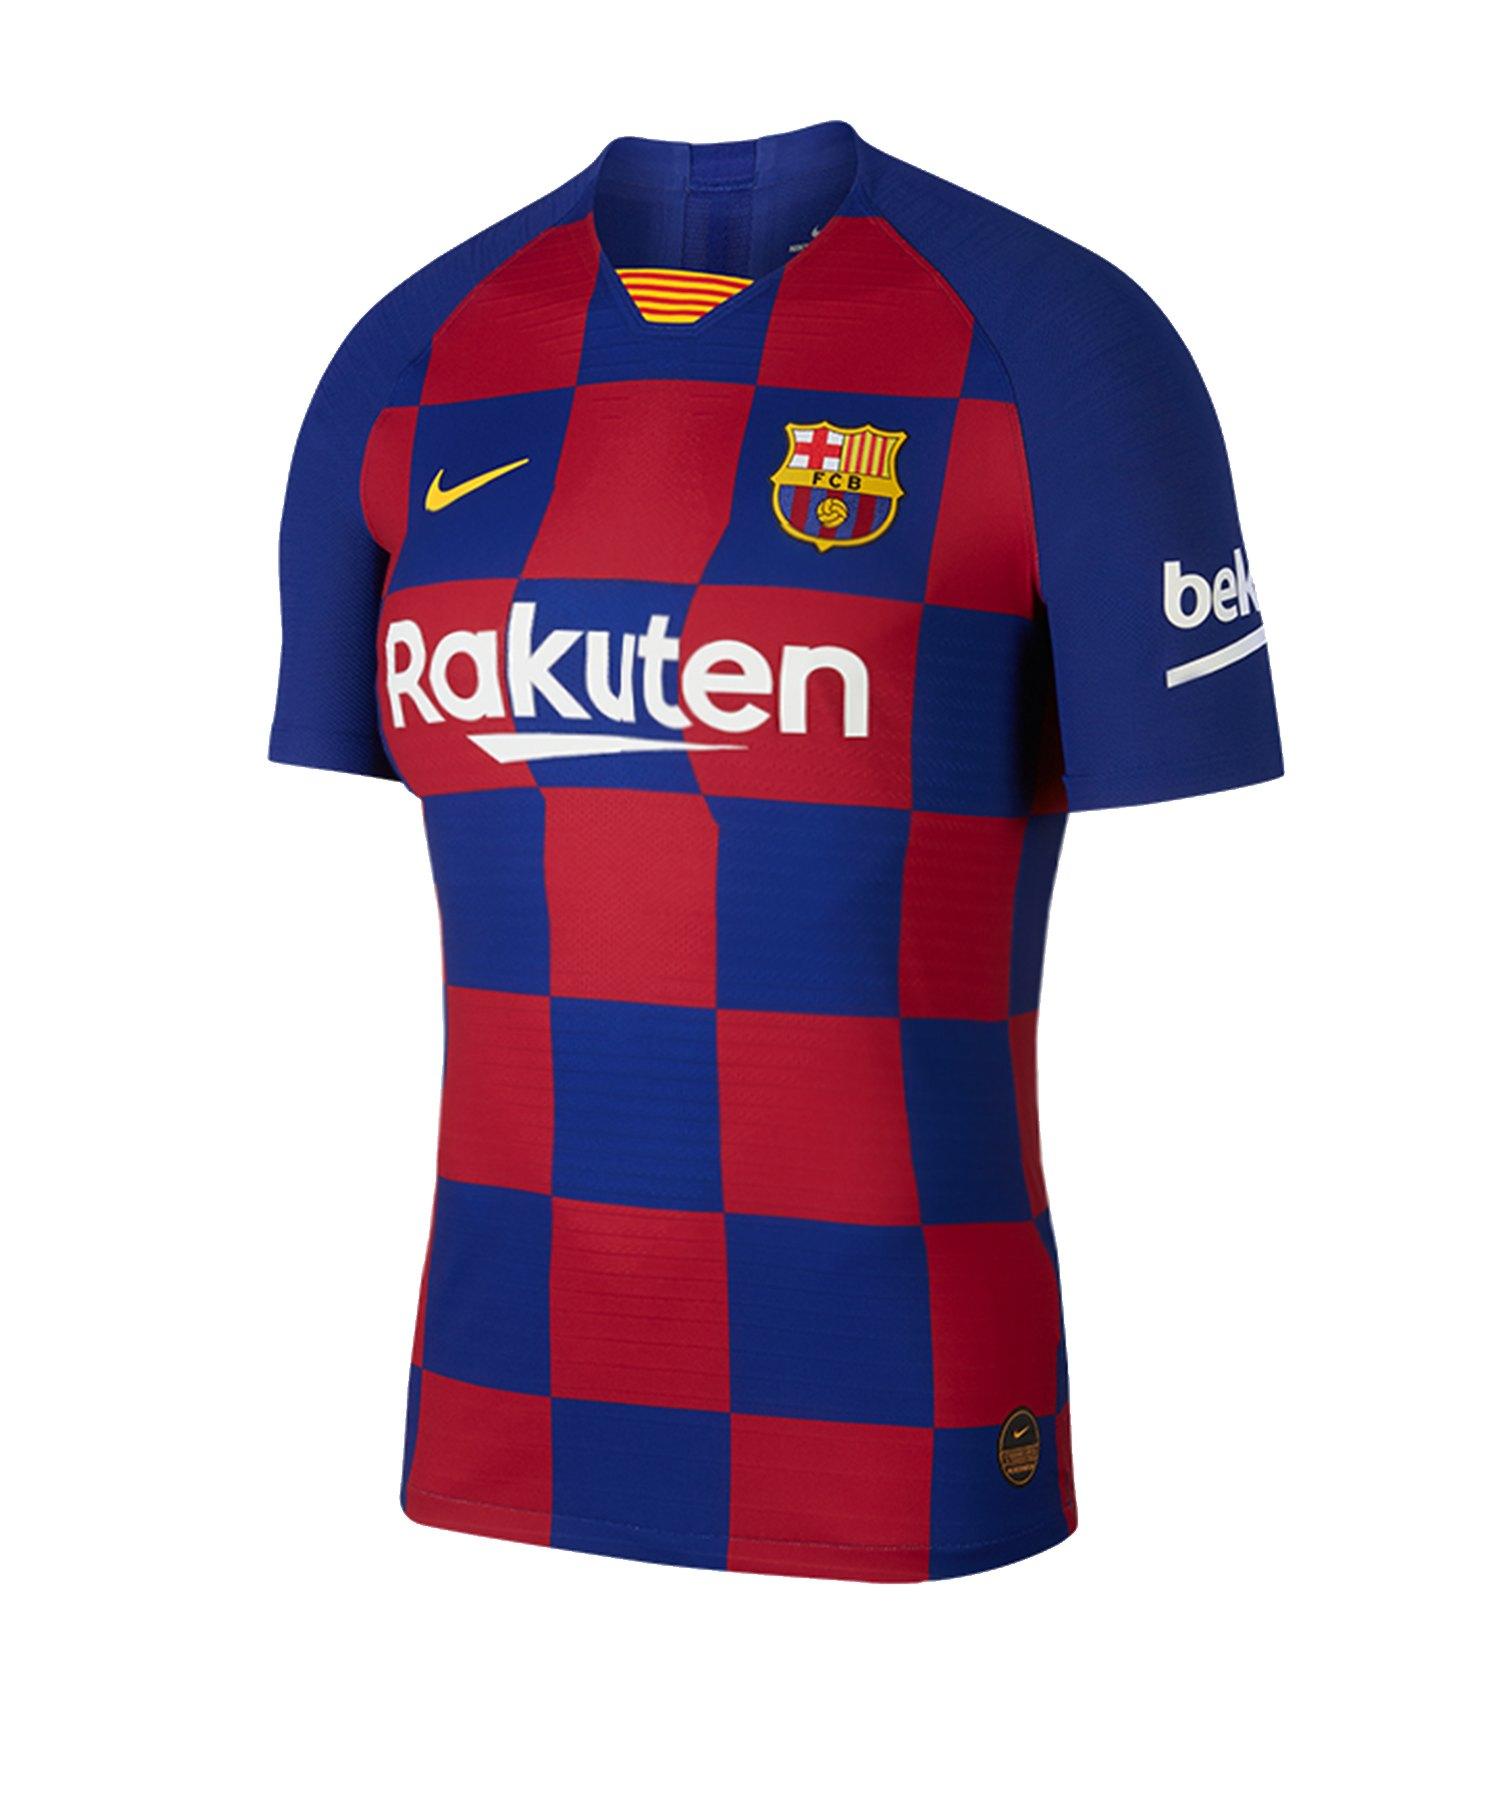 Nike FC Barcelona Trikot Home 2019/2020 Damen F456 - Blau